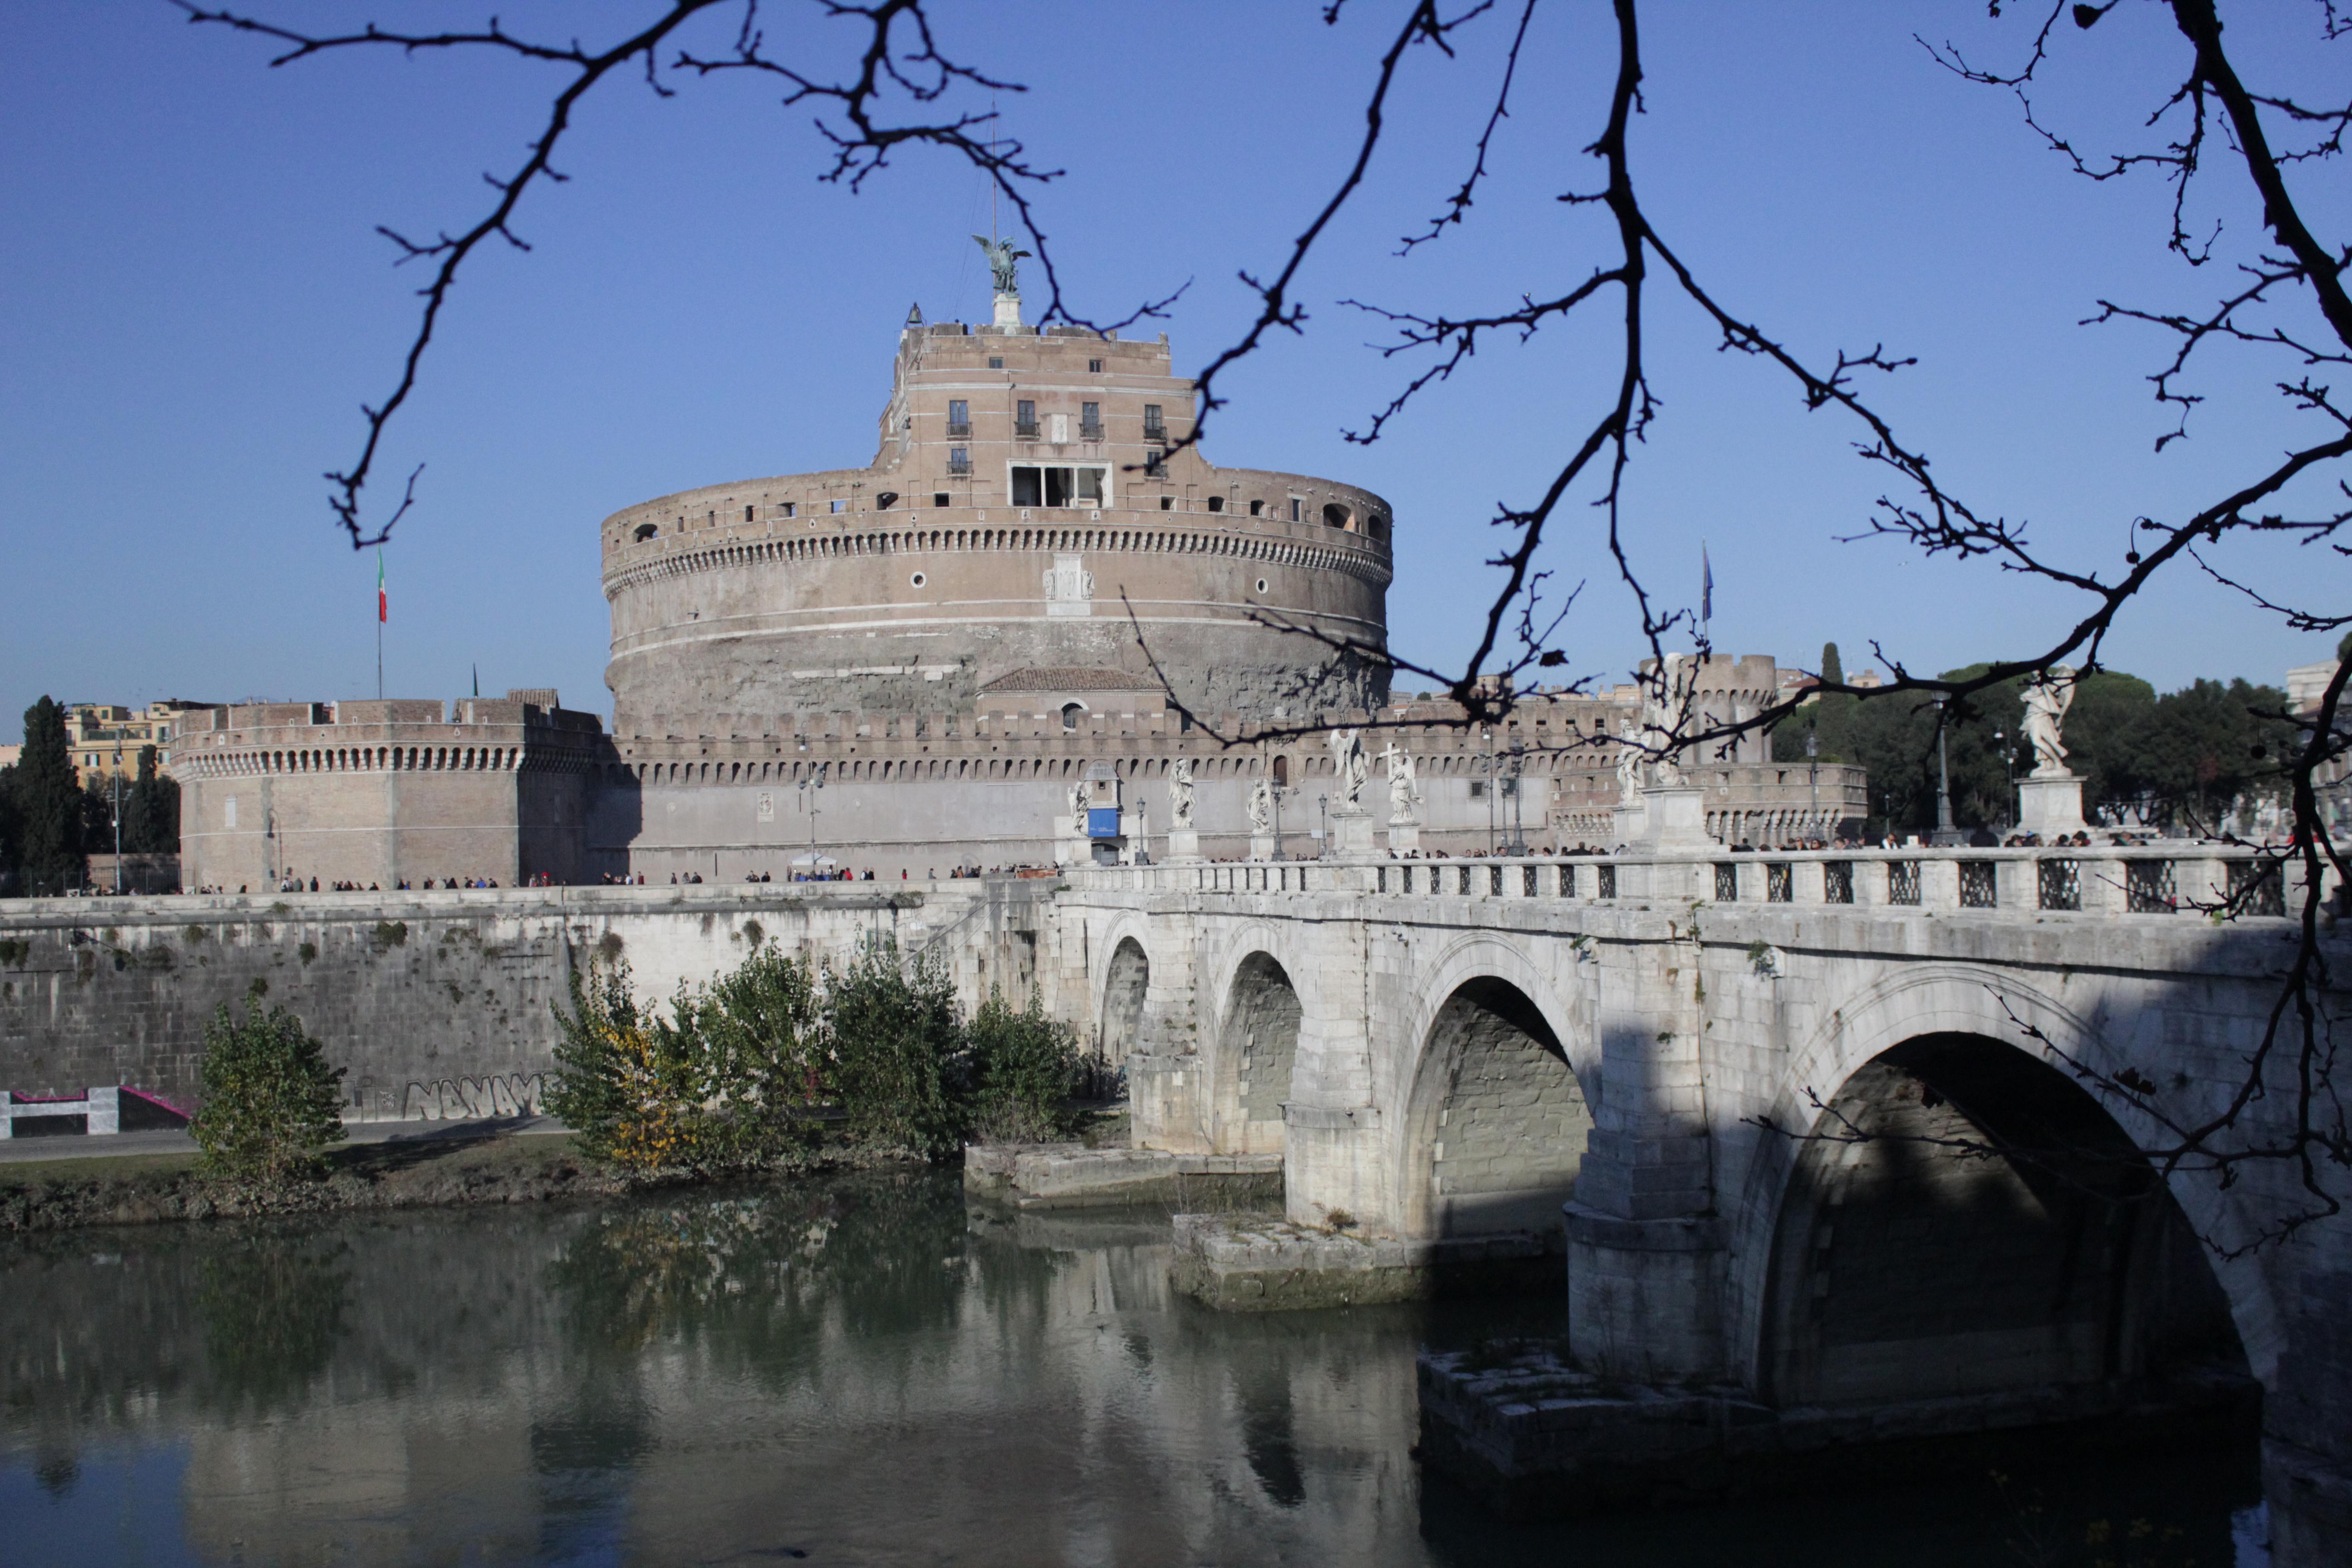 Castell Sant Angelo